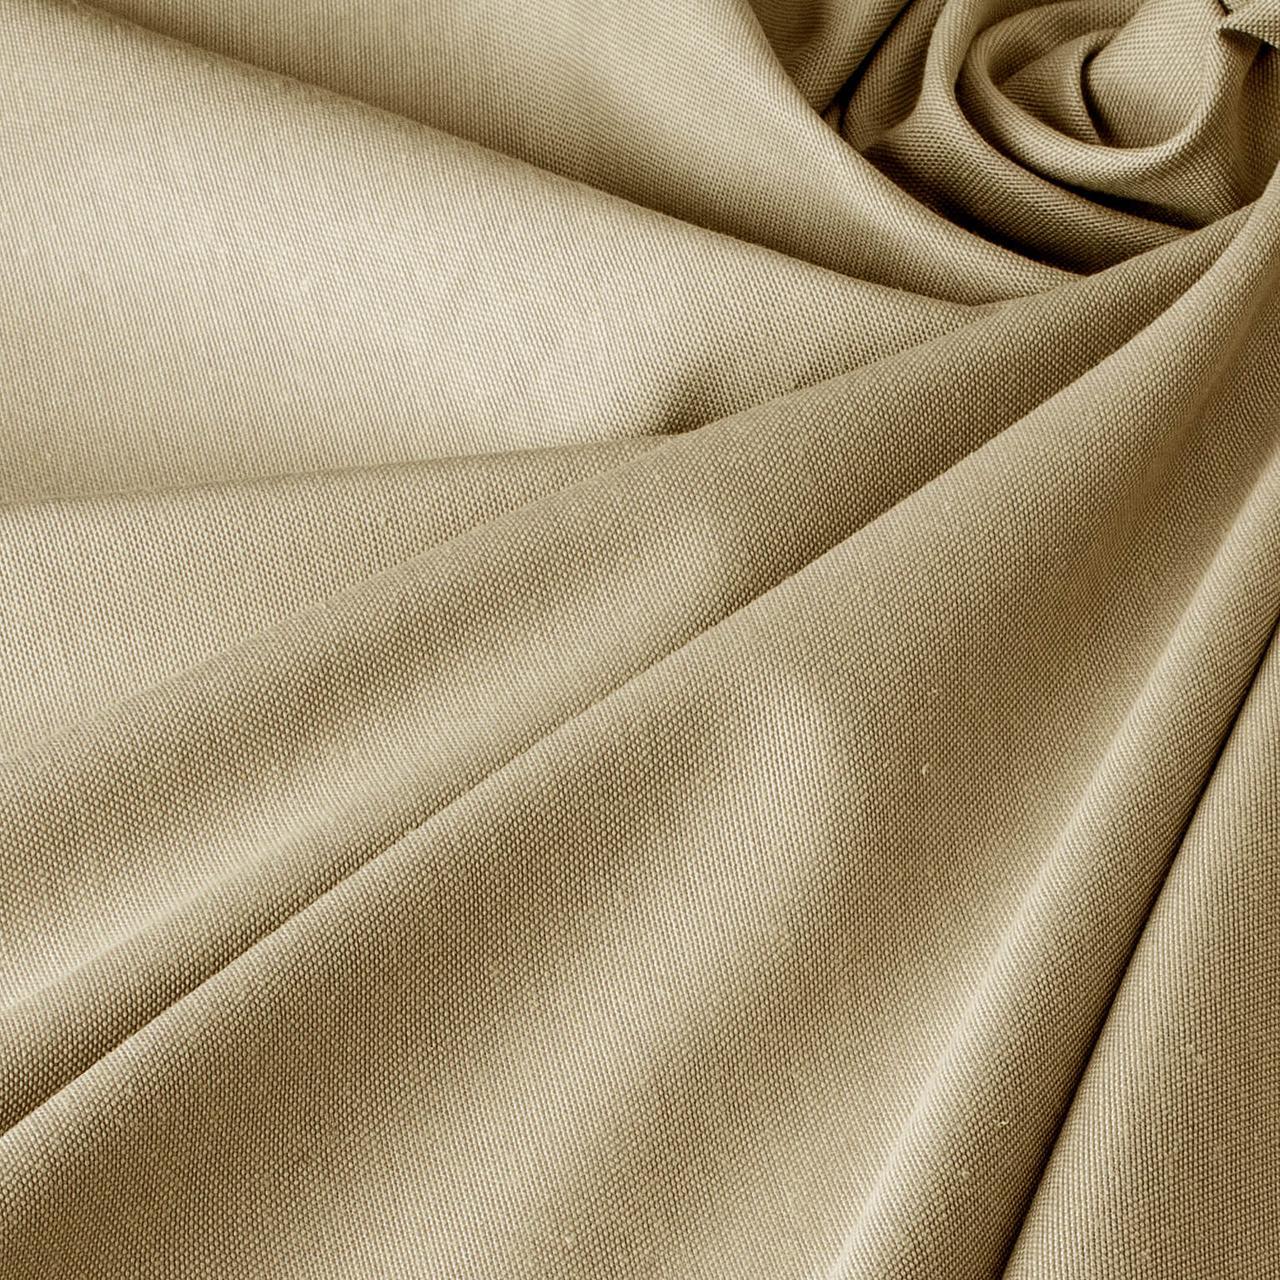 Ткань для штор и скатертей Teflon 81004